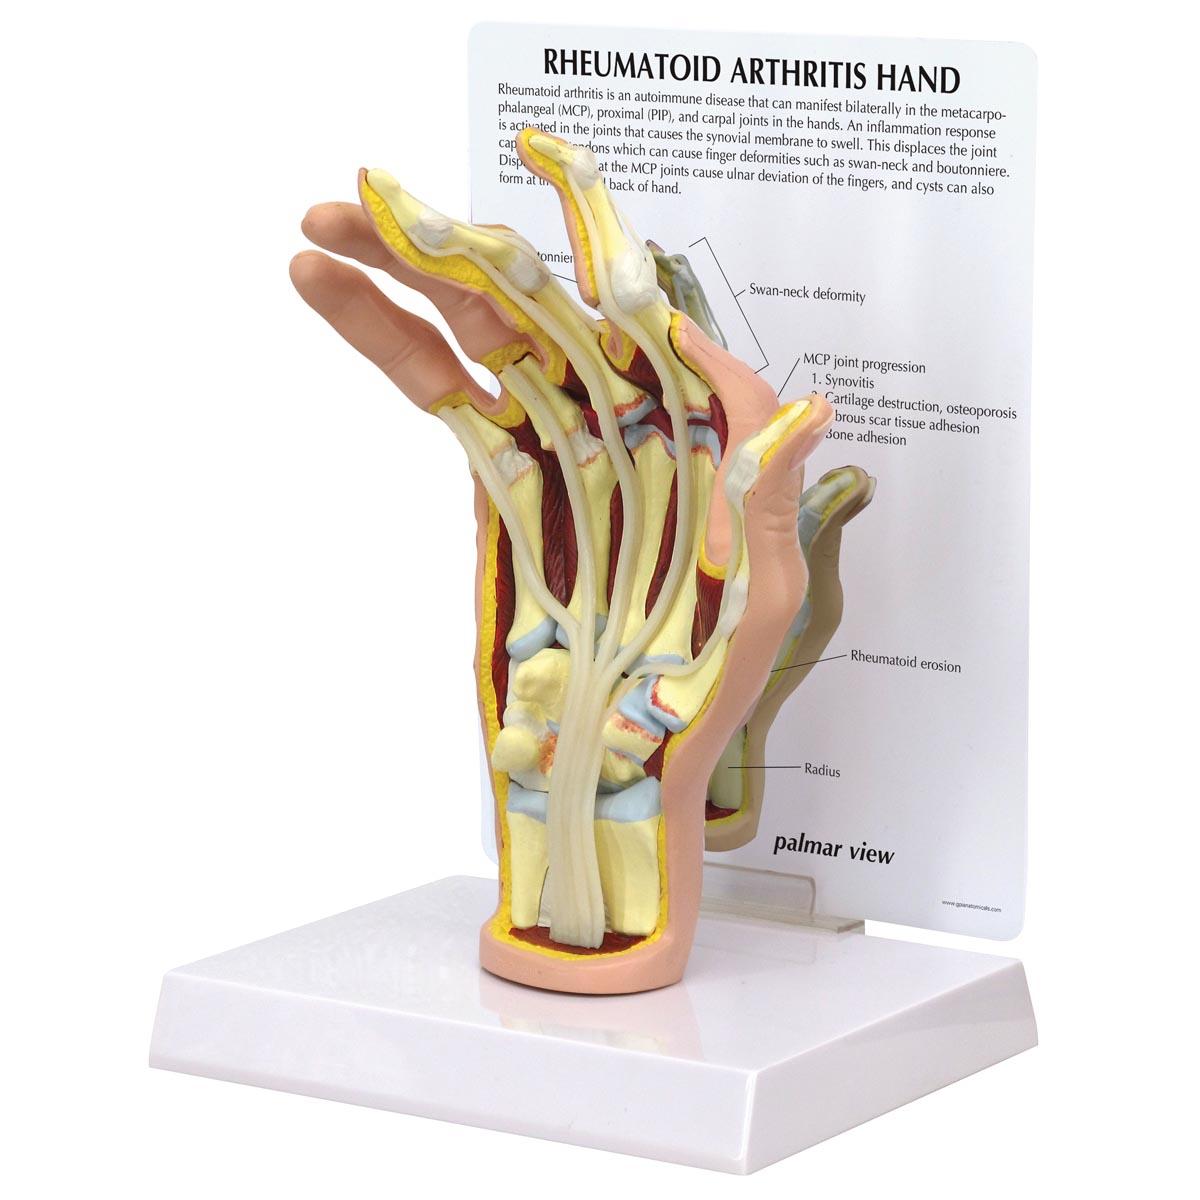 GPI 1931 Handmodell mit rheumatoider Arthritis, Handmodell